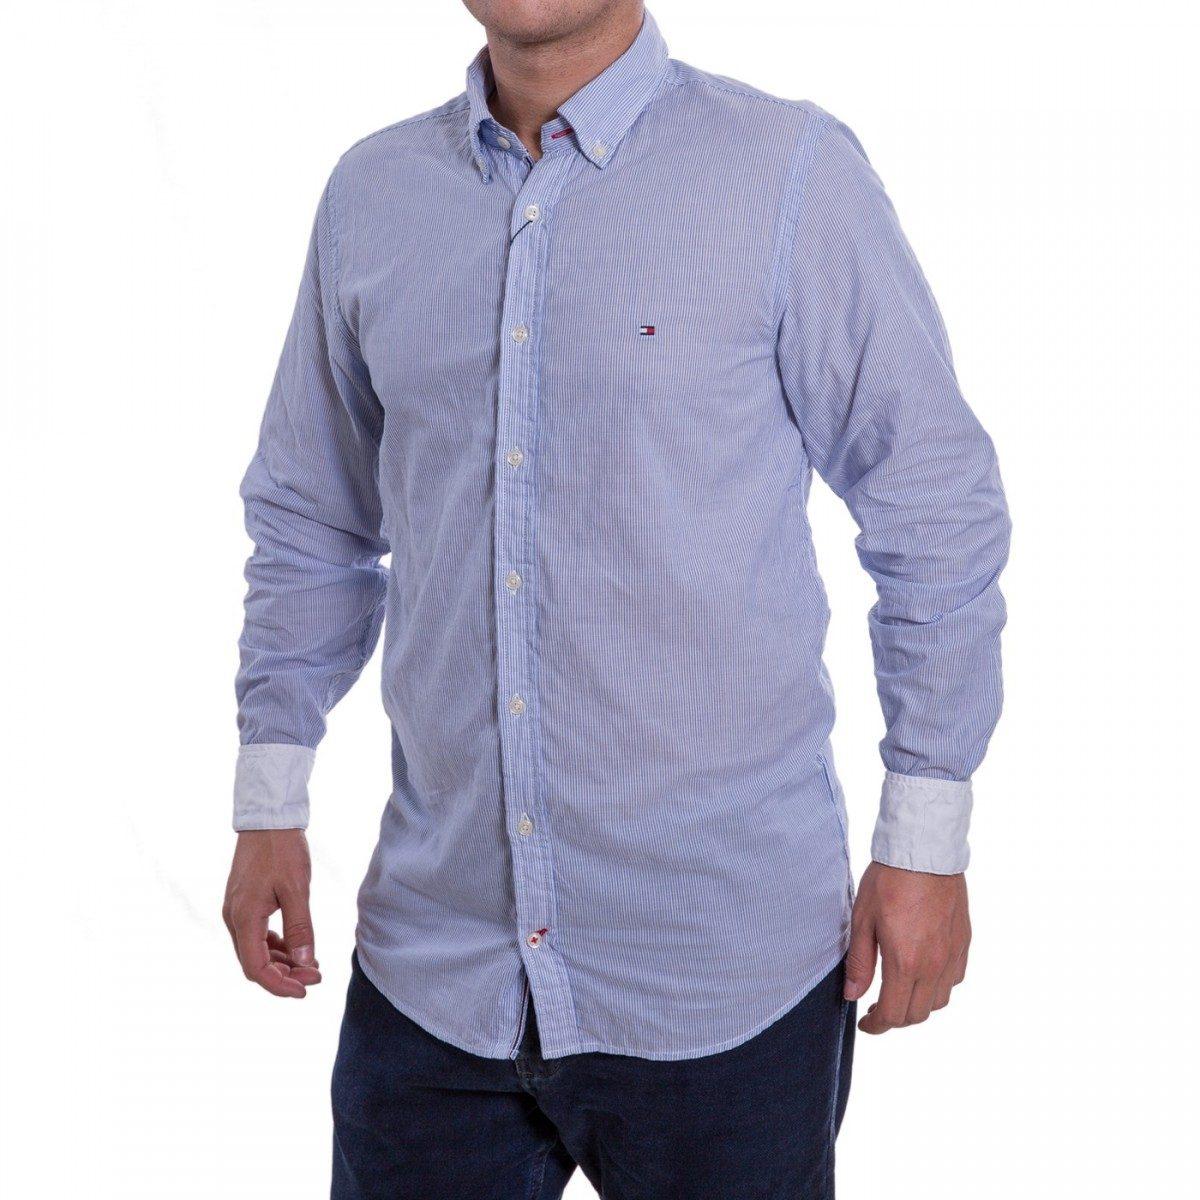 dce4825fe95 camisa social masculina tommy hilfiger slim fit manga longa. Carregando  zoom.